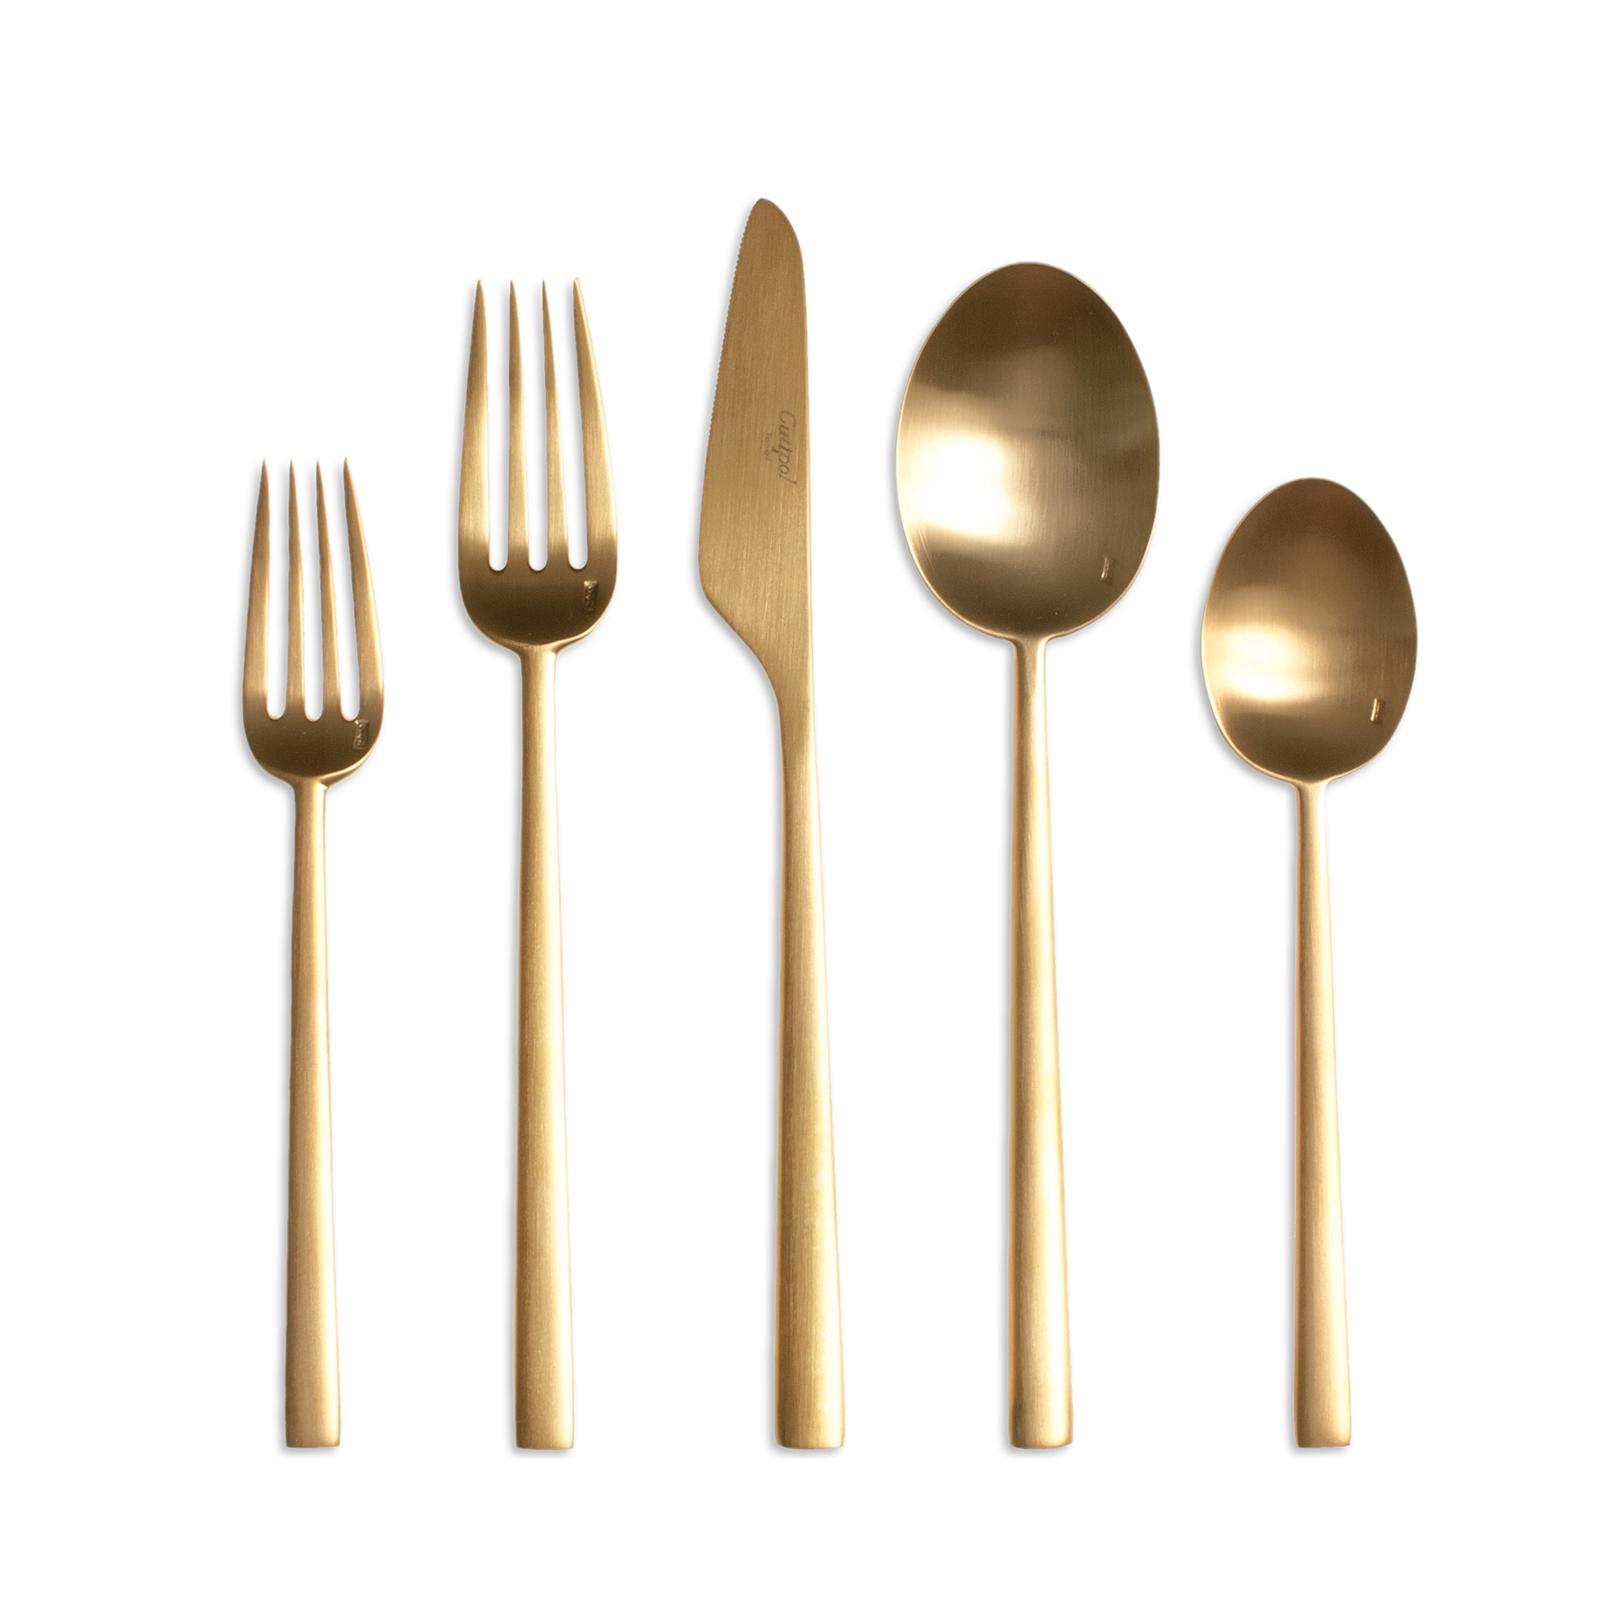 warm-toned modern metal flatware